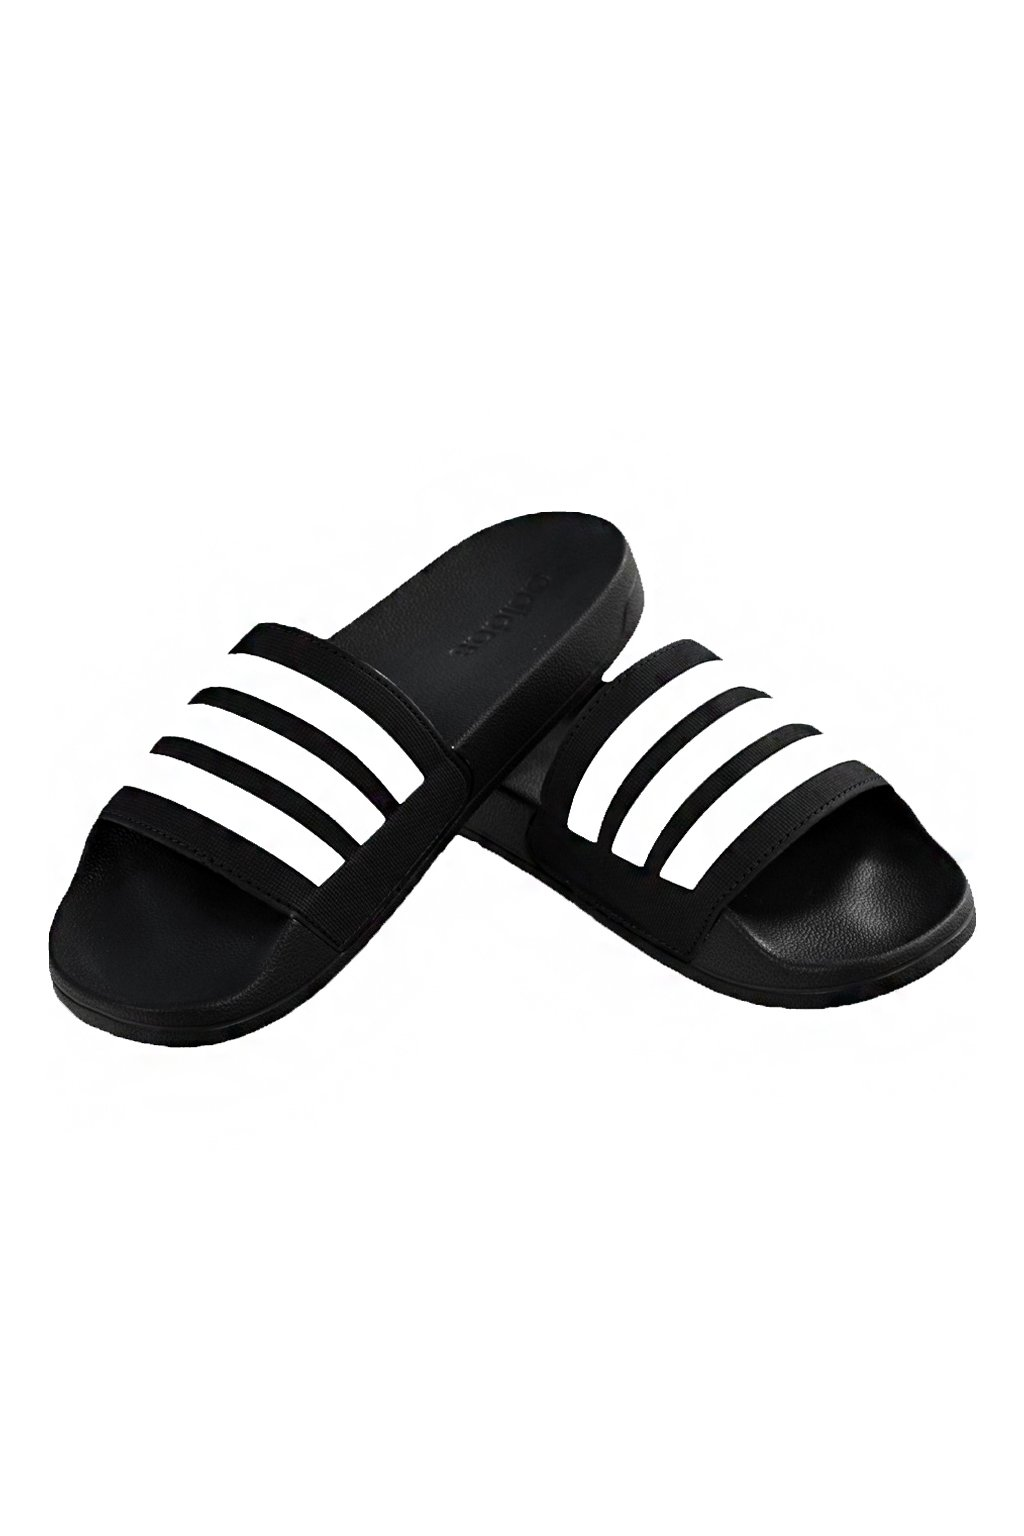 Šľapky Adidas Adilette Cloudfoam Plus Stripes čierna AP9971